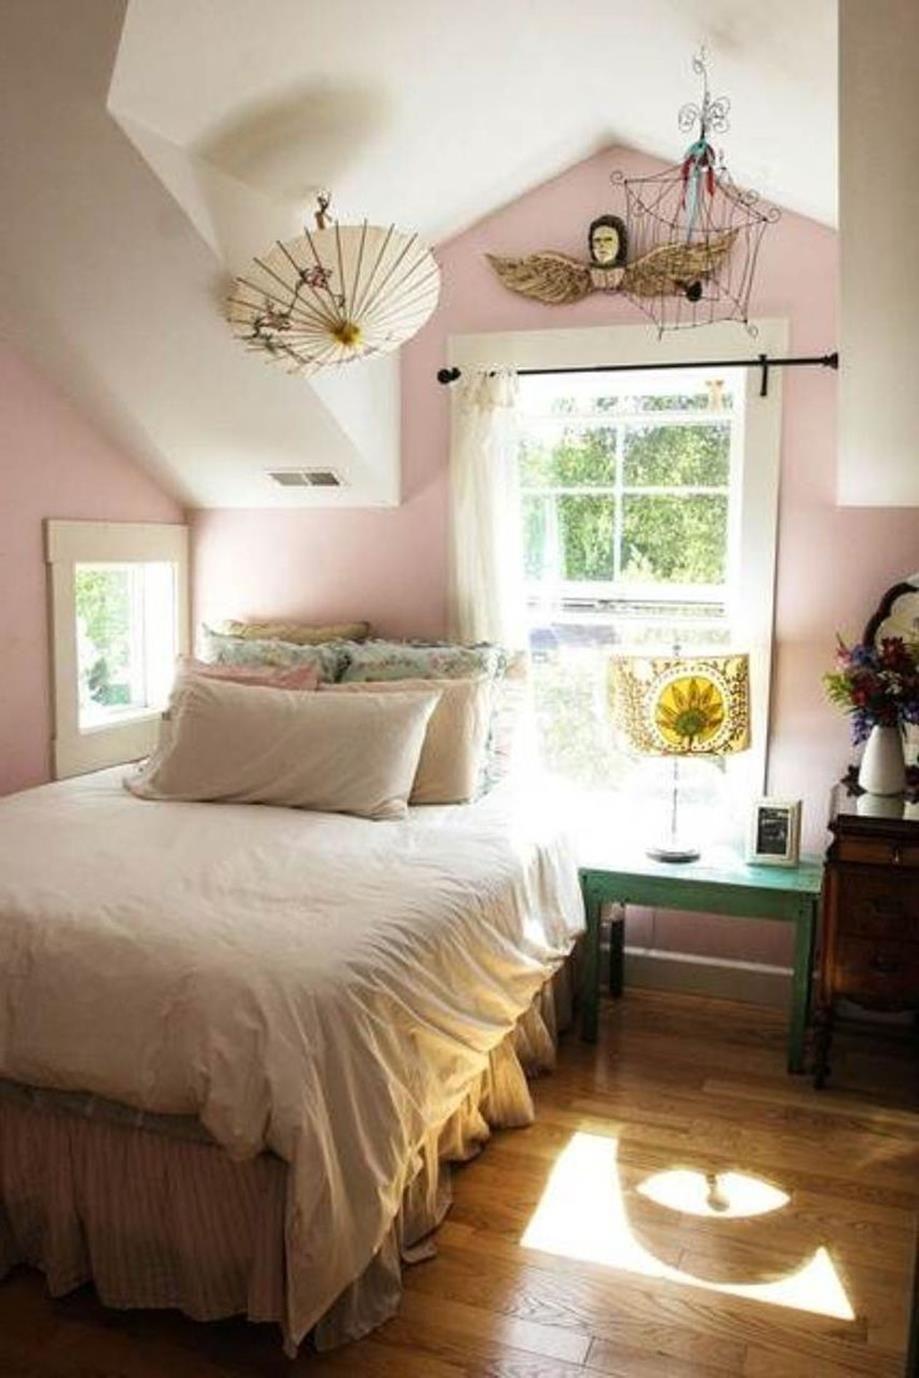 30 Perfect Attic Bedroom Ideas For Girls Attic Bedroom Designs